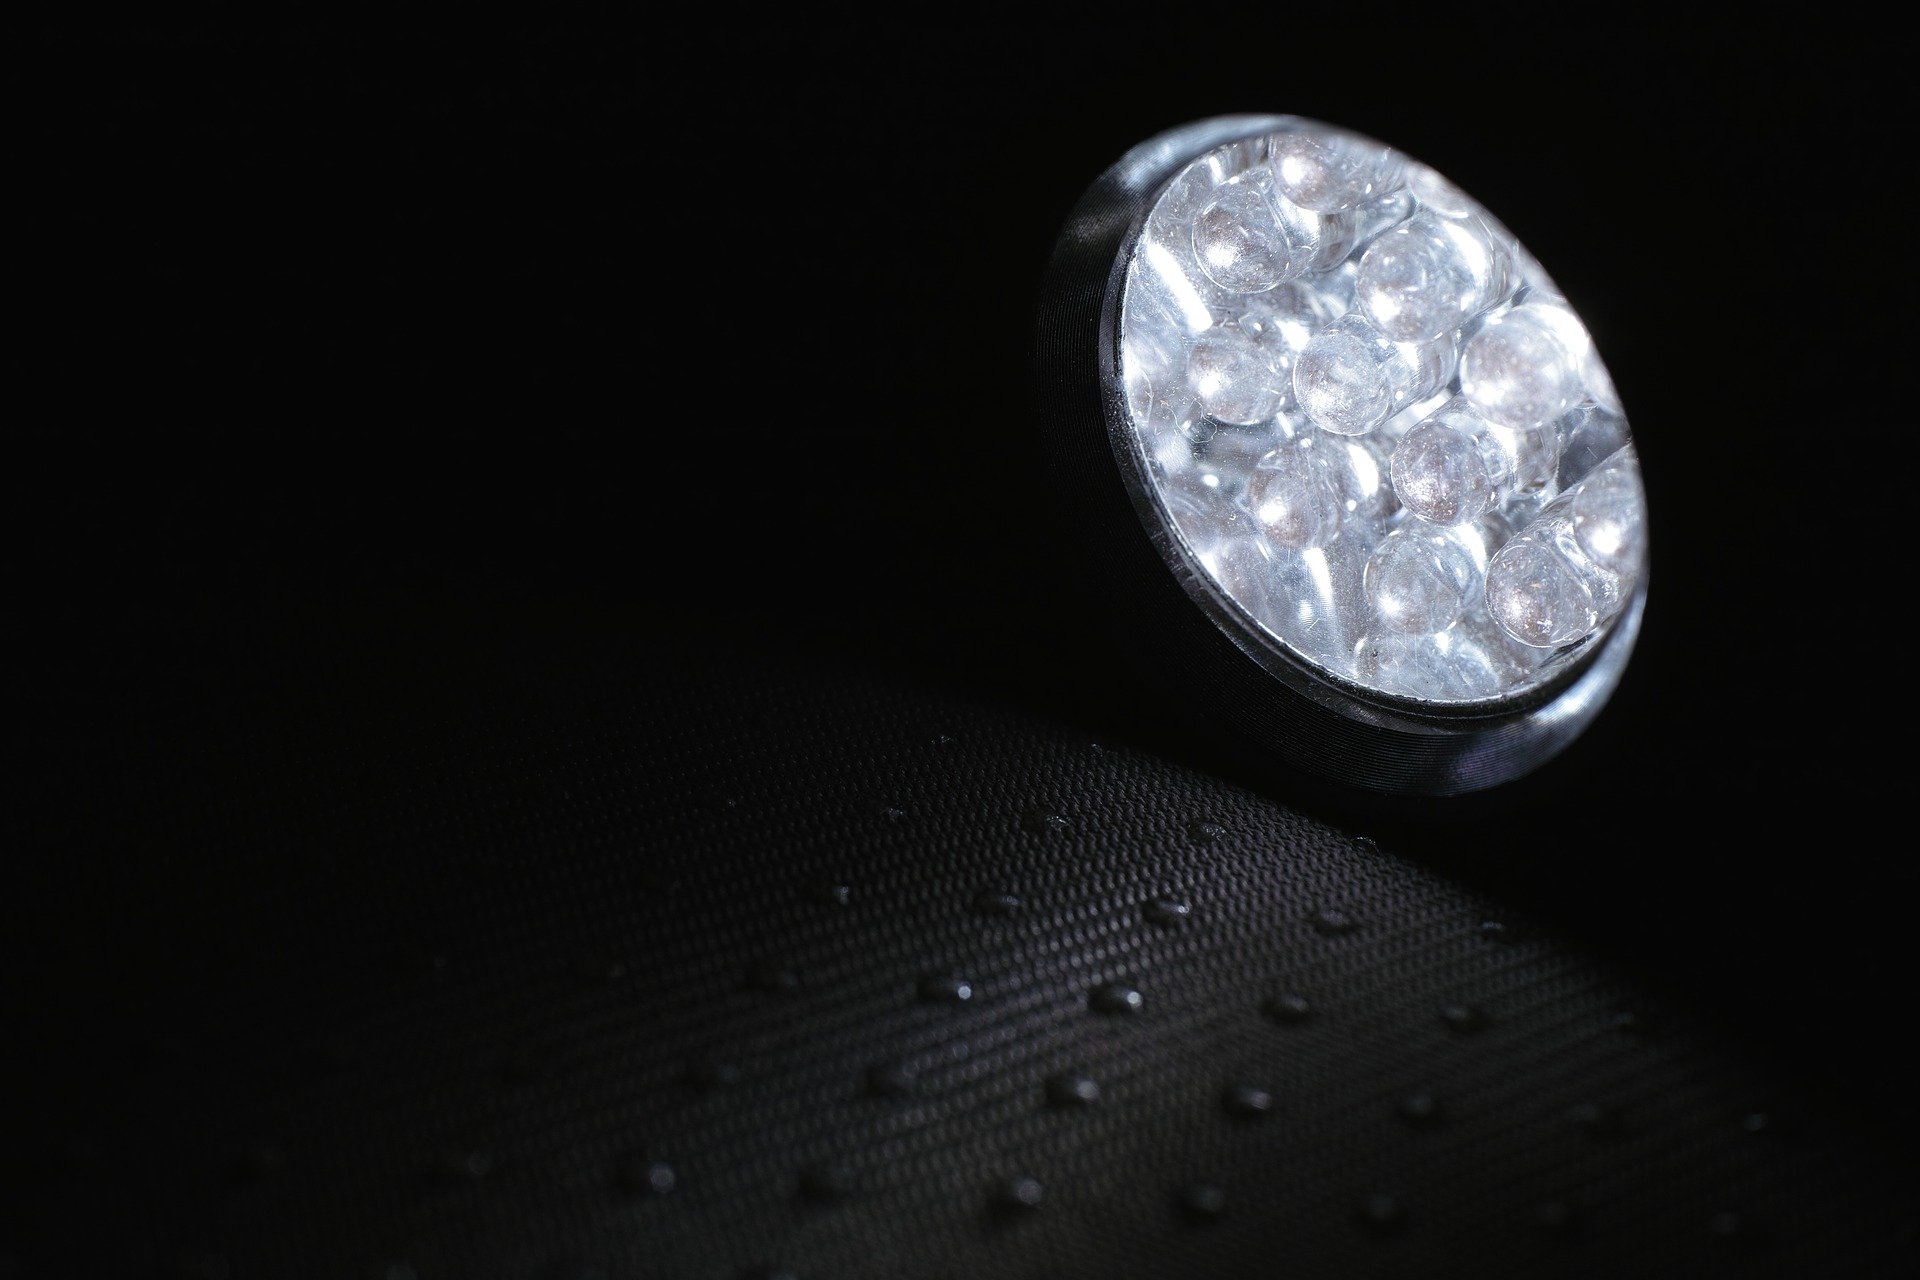 LED Tauchlampe im dunklen Wasser